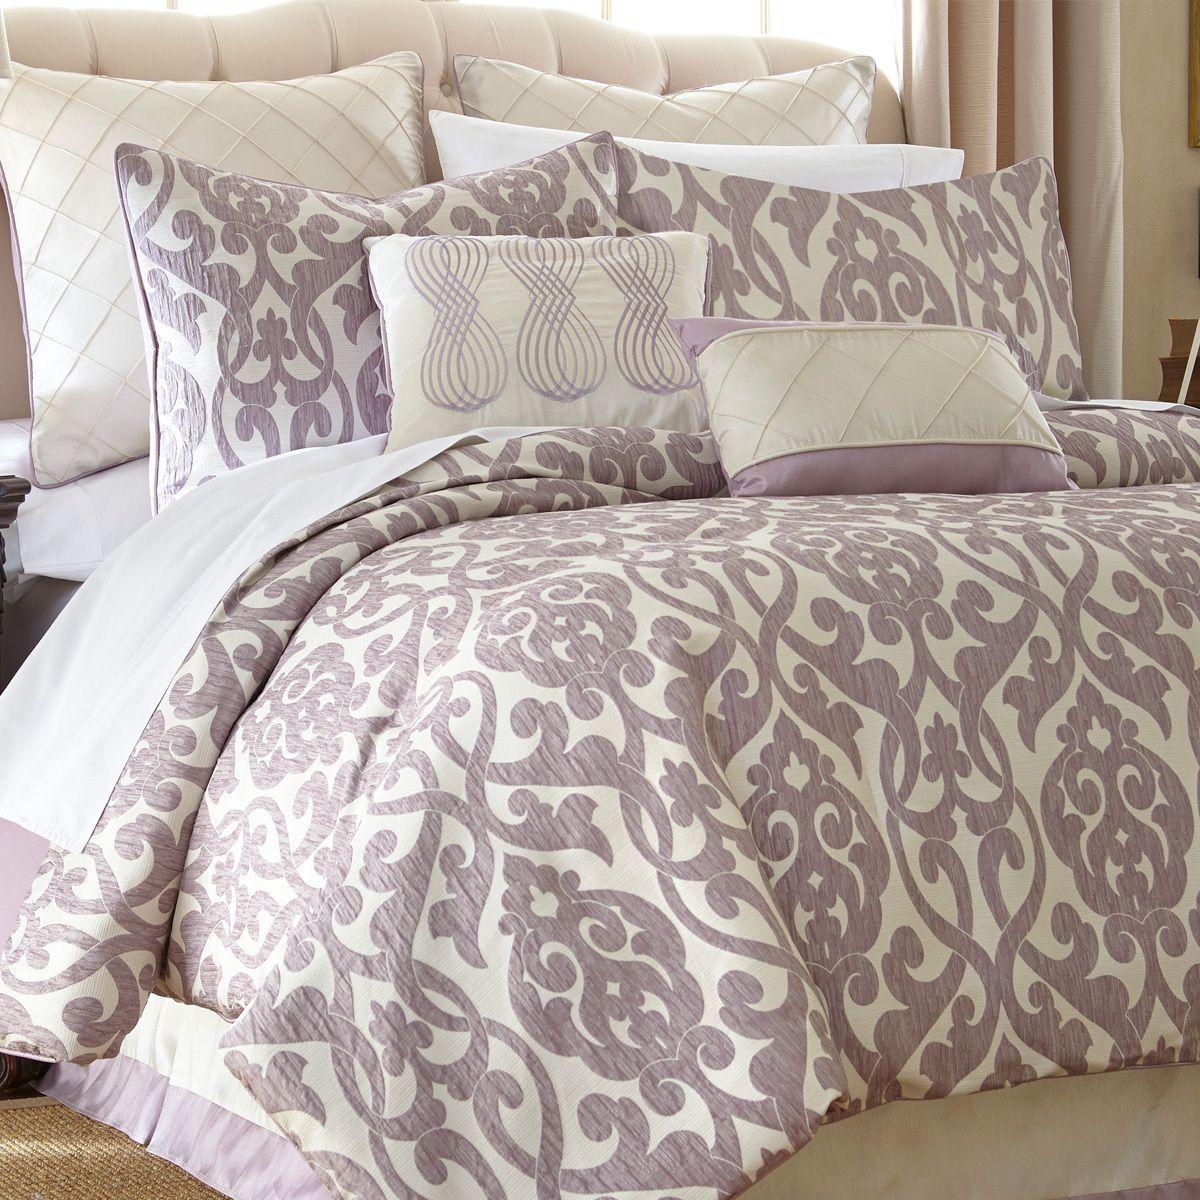 Wayfair basics wayfair basics 7 piece comforter set amp reviews - 17 Best Images About Comforters On Pinterest Grey Walls Carpets And Peach Bedding